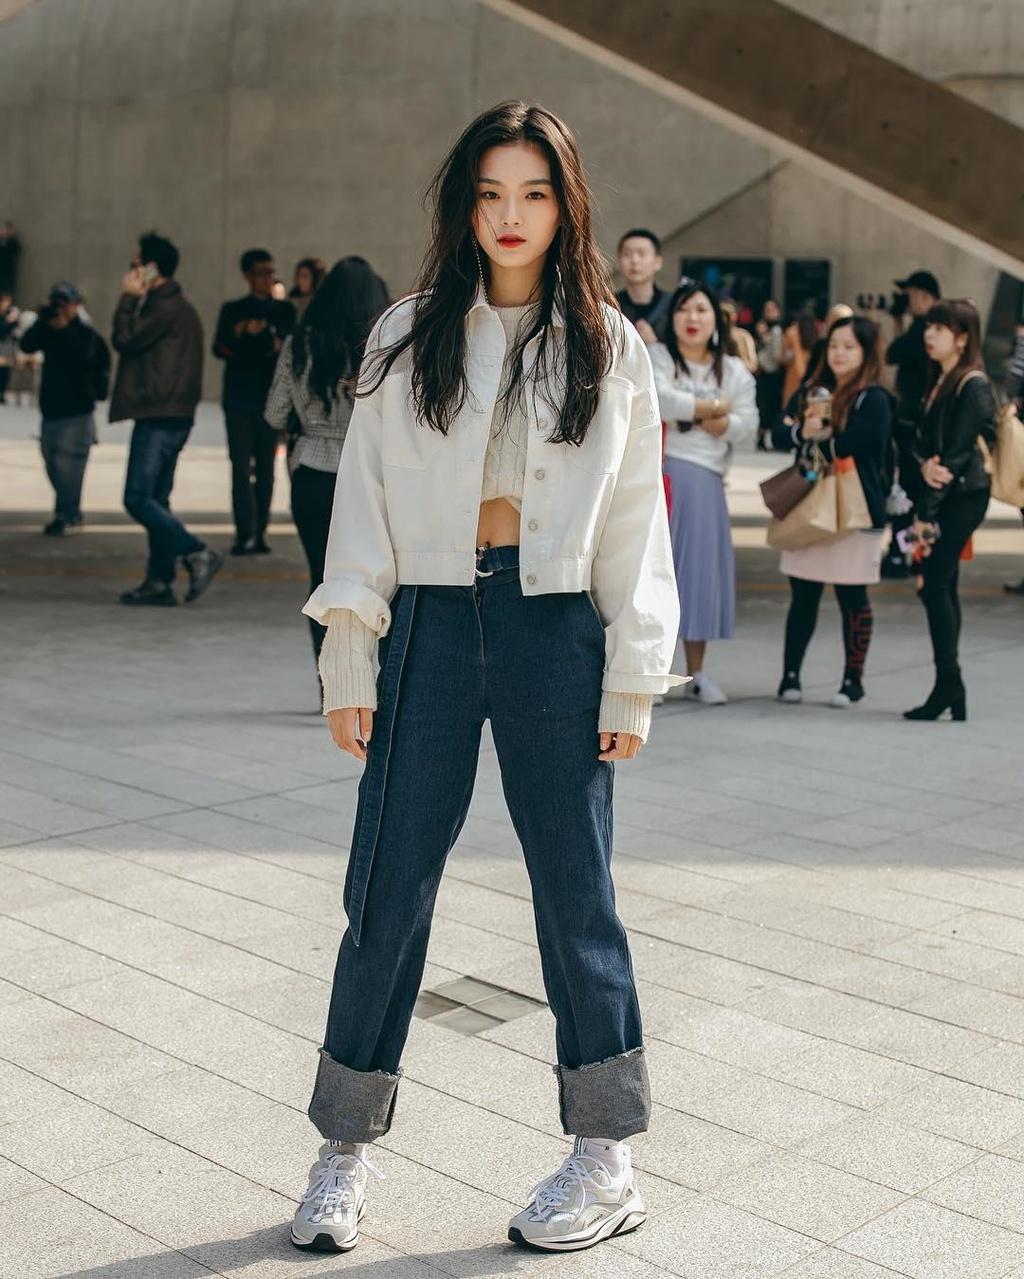 Hinh anh A quan The Face tai Seoul Fashion Week len Vogue hinh anh 14